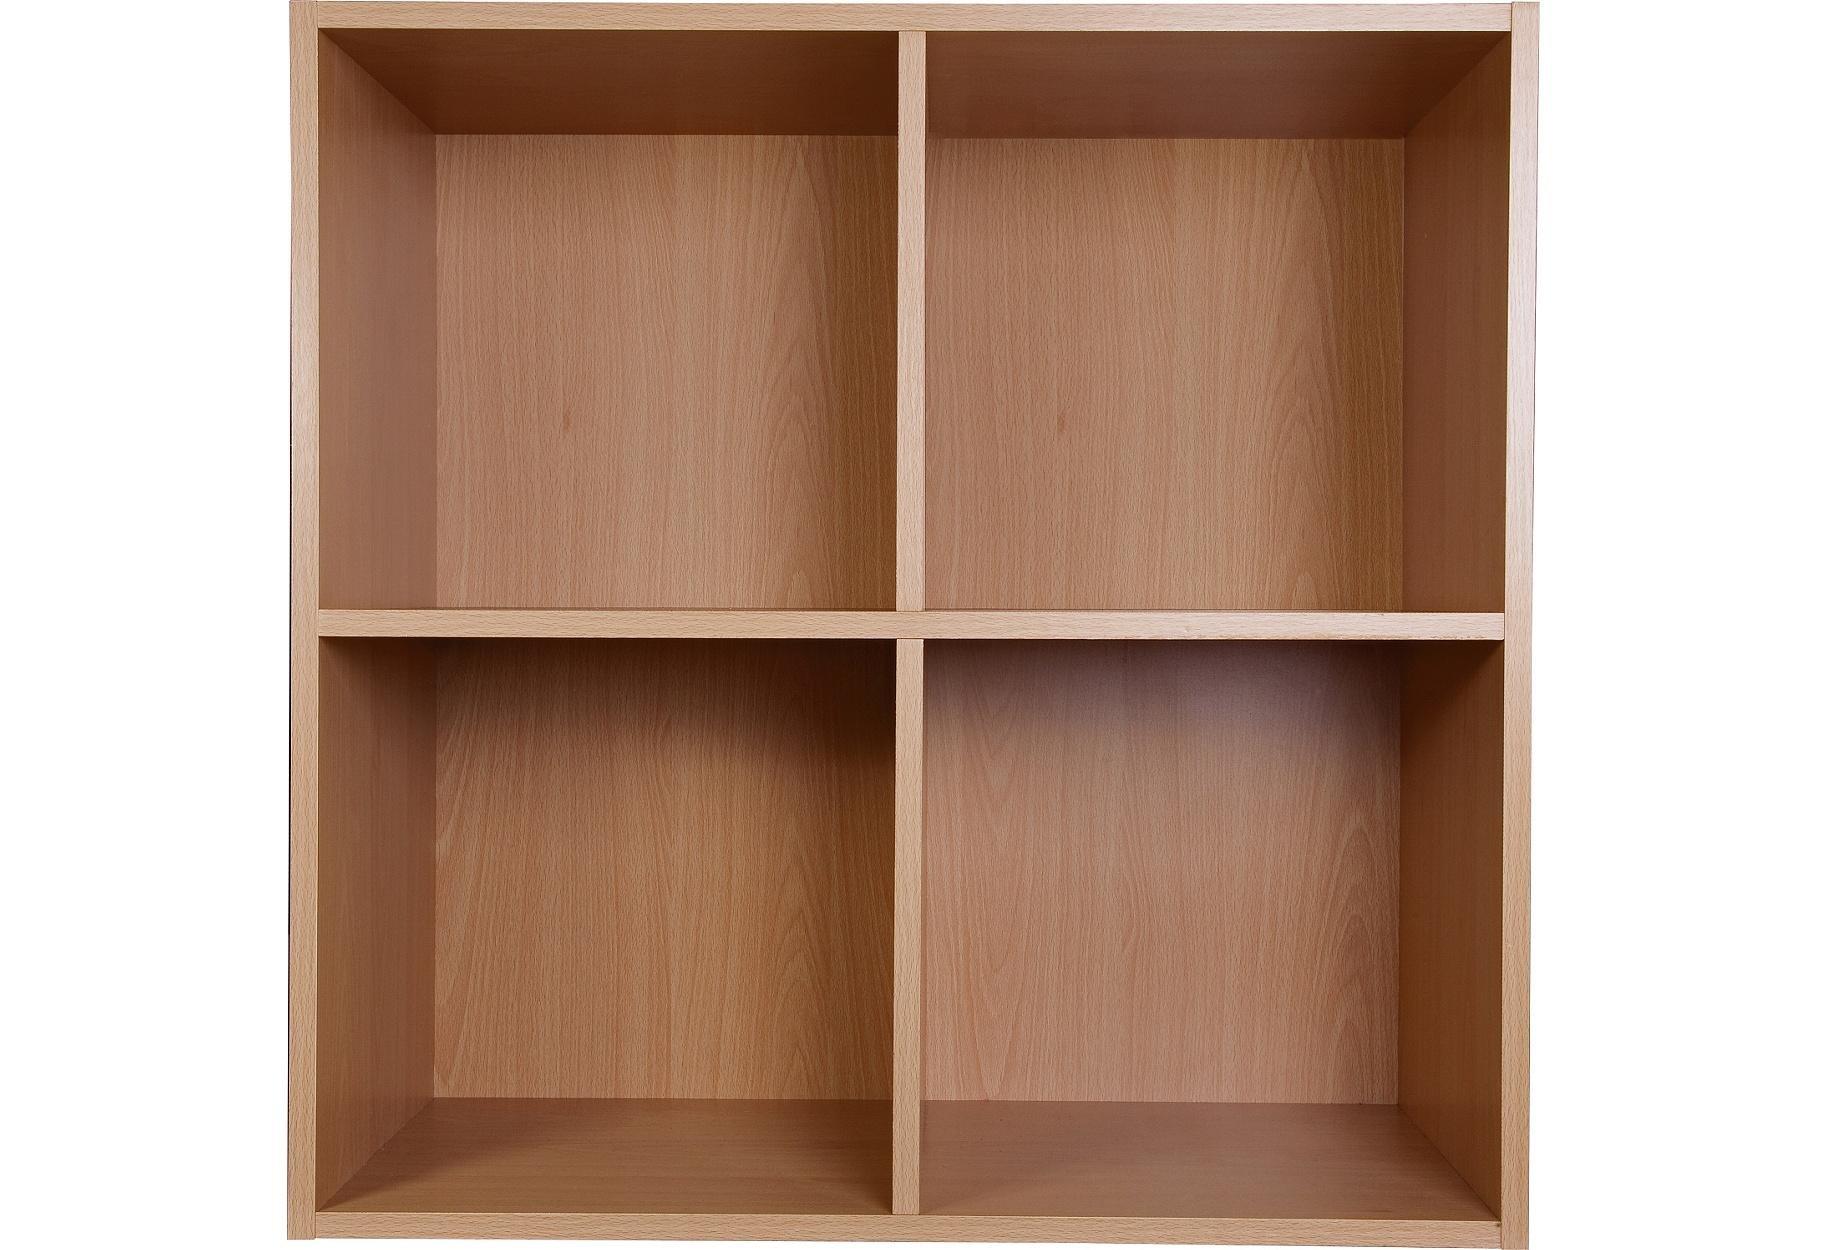 phoenix-2-x-2-cube-storage-unit-beech-effect